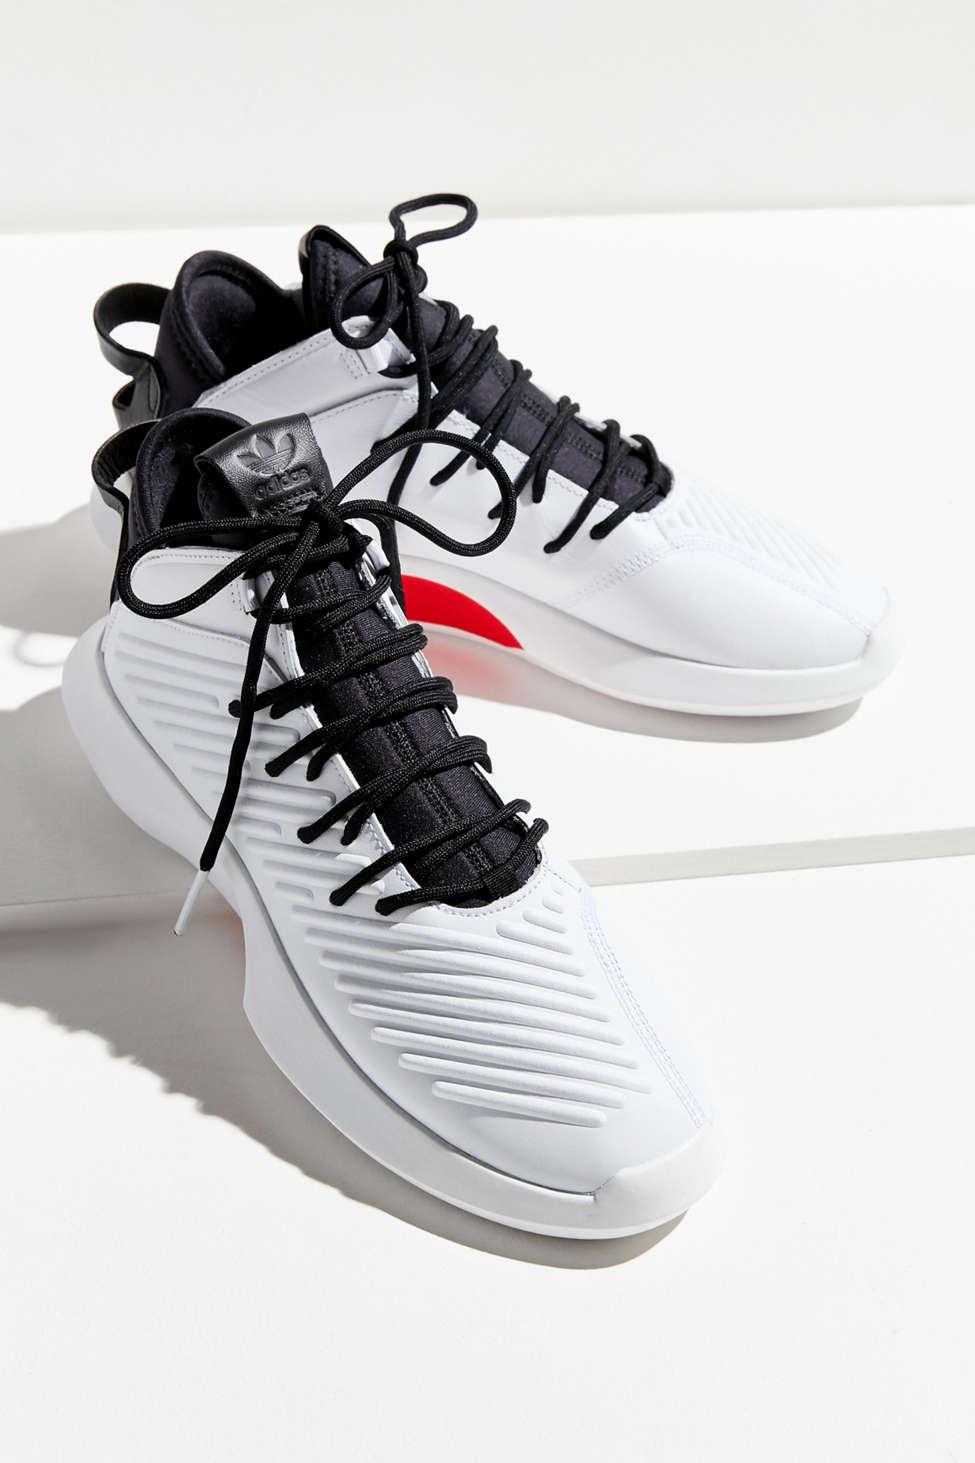 best sneakers 5f88c e443e pazzo 1 avanzata adidas urban outfitters di scarpe da ginnastica adidas  avanzata a11832